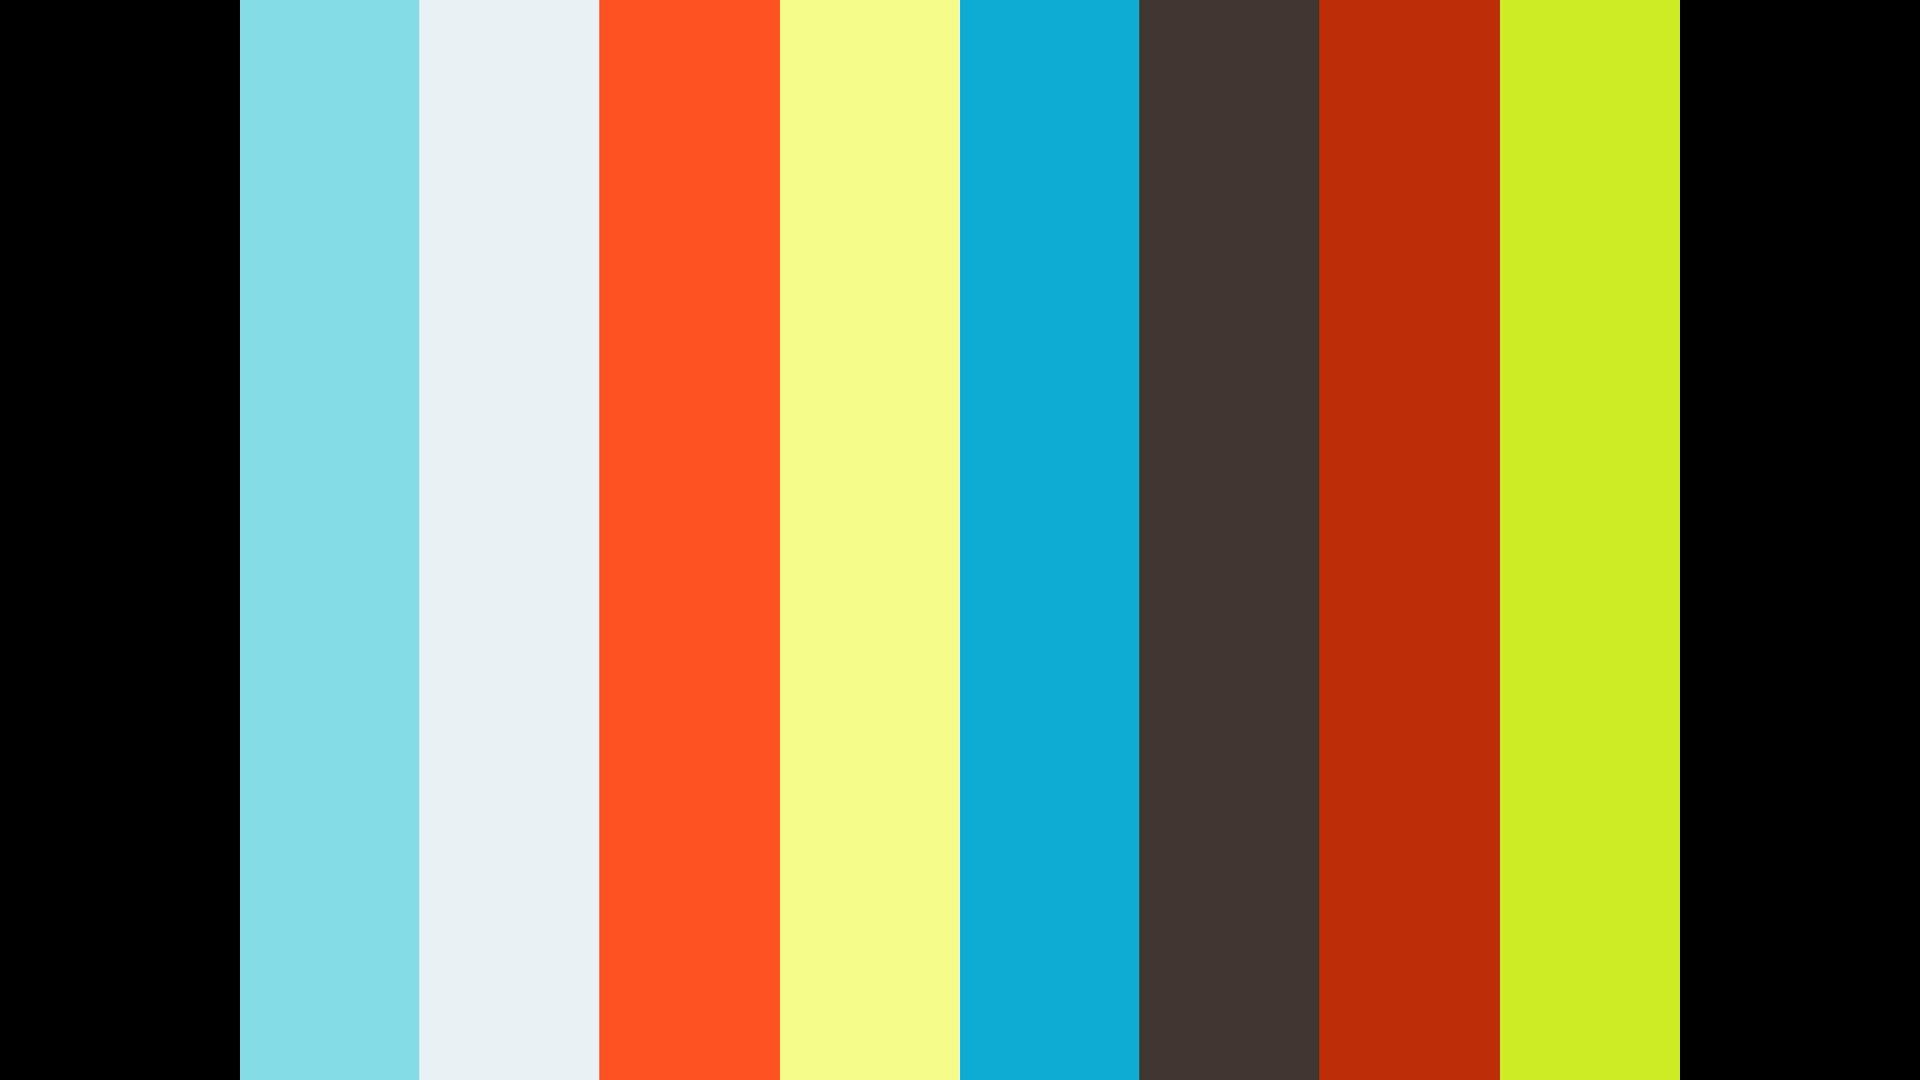 Populous feat. M¥SS KETA & Kenjii - HOUSE OF KETA [OFFICIAL]